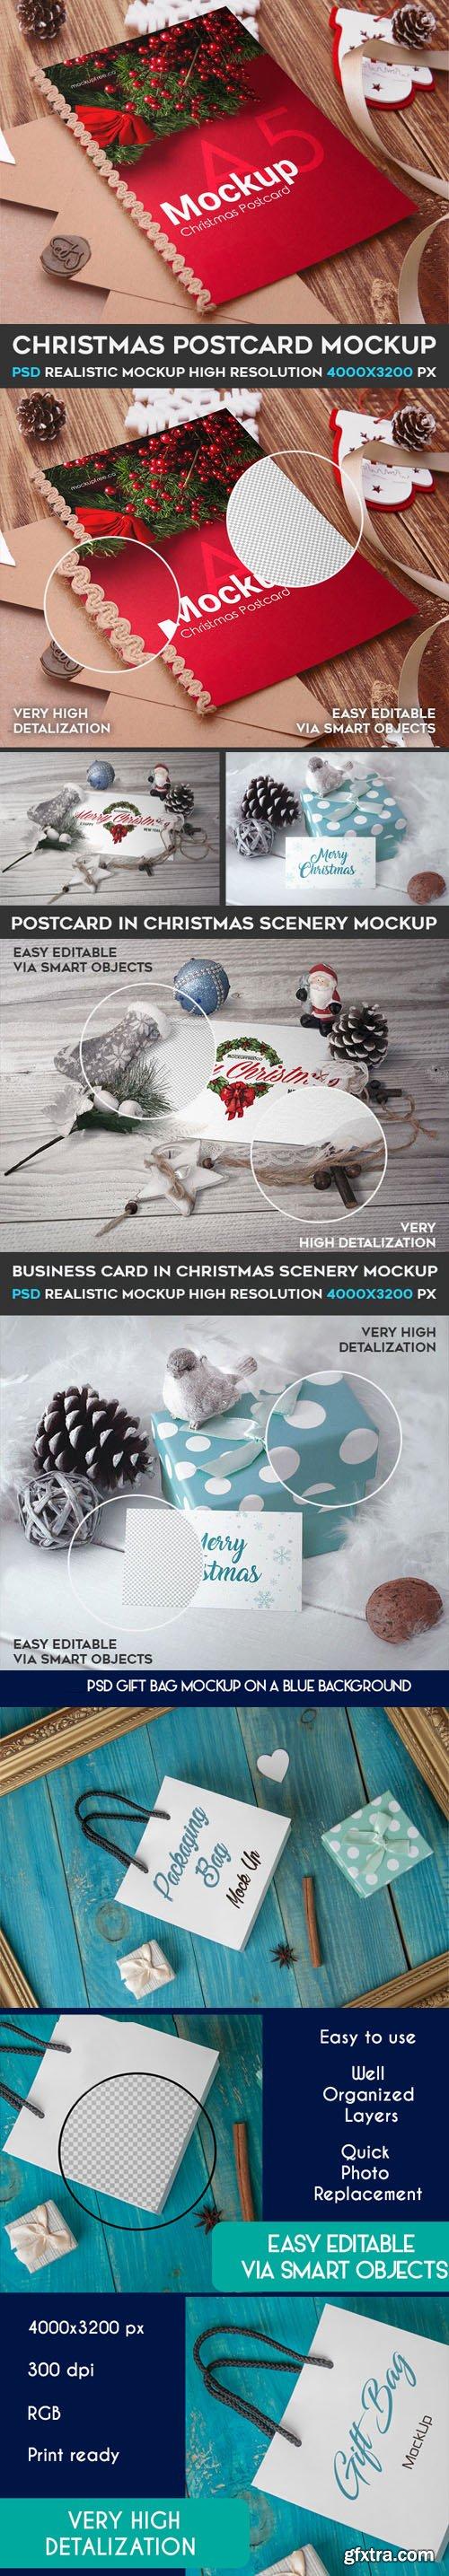 Christmas Postcard + Gift Bag Mockups Collection in PSD